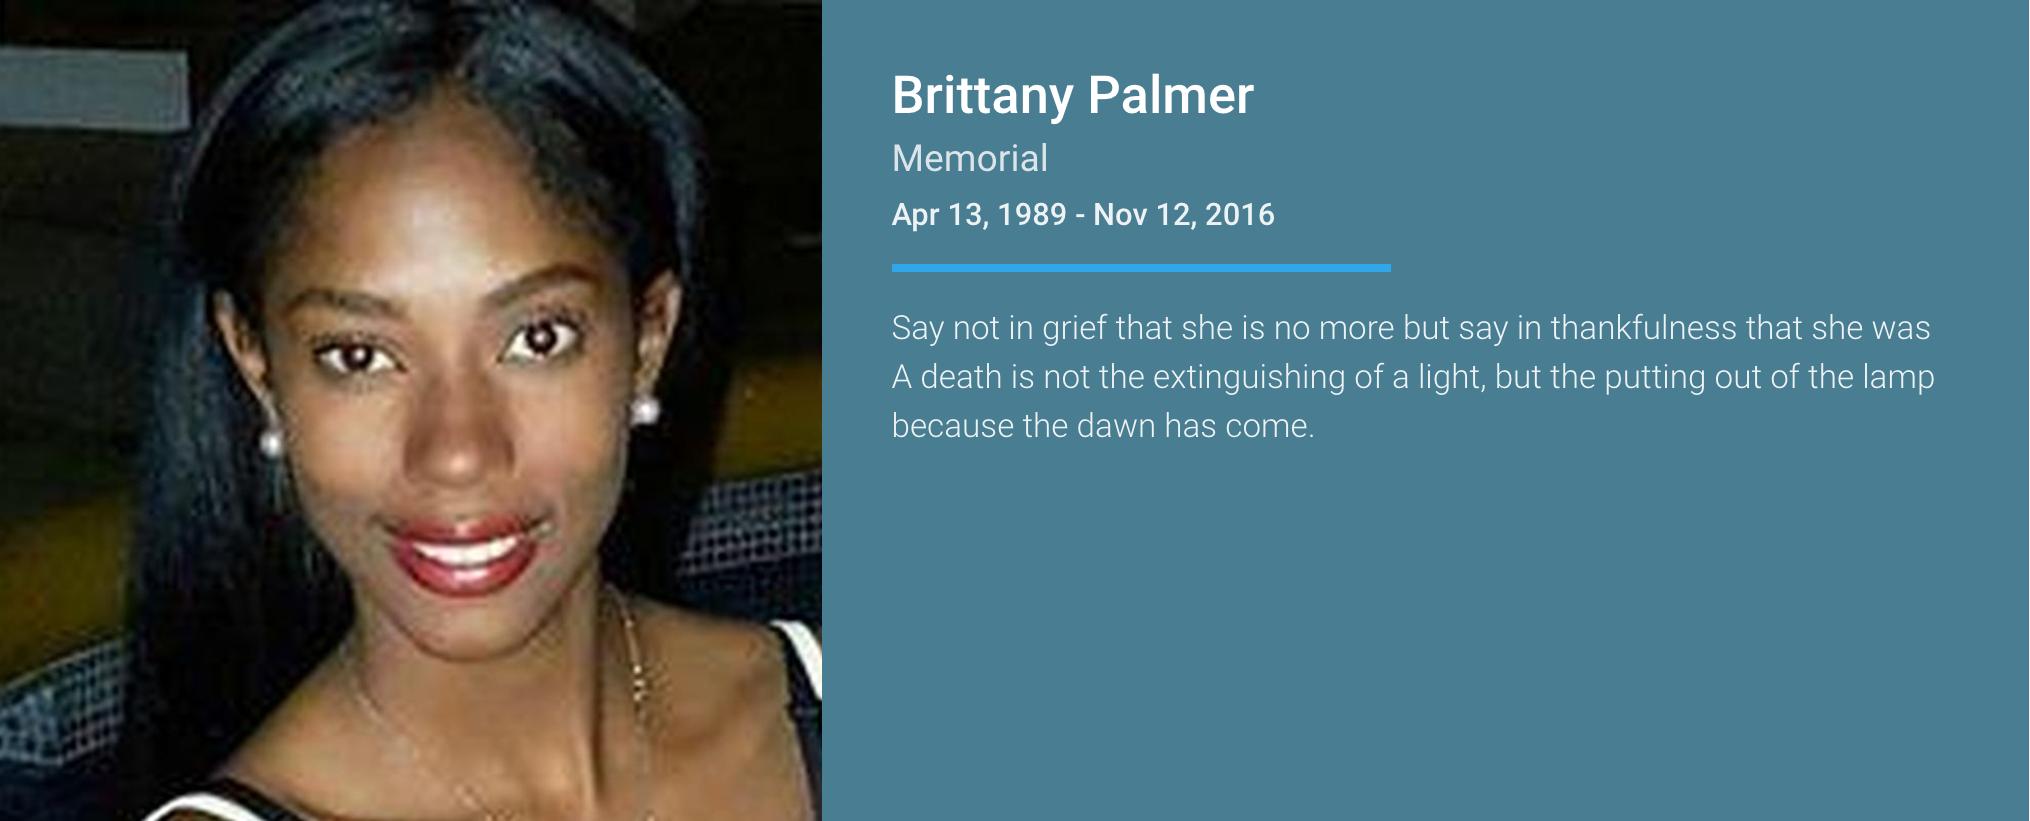 Brittany Palmer